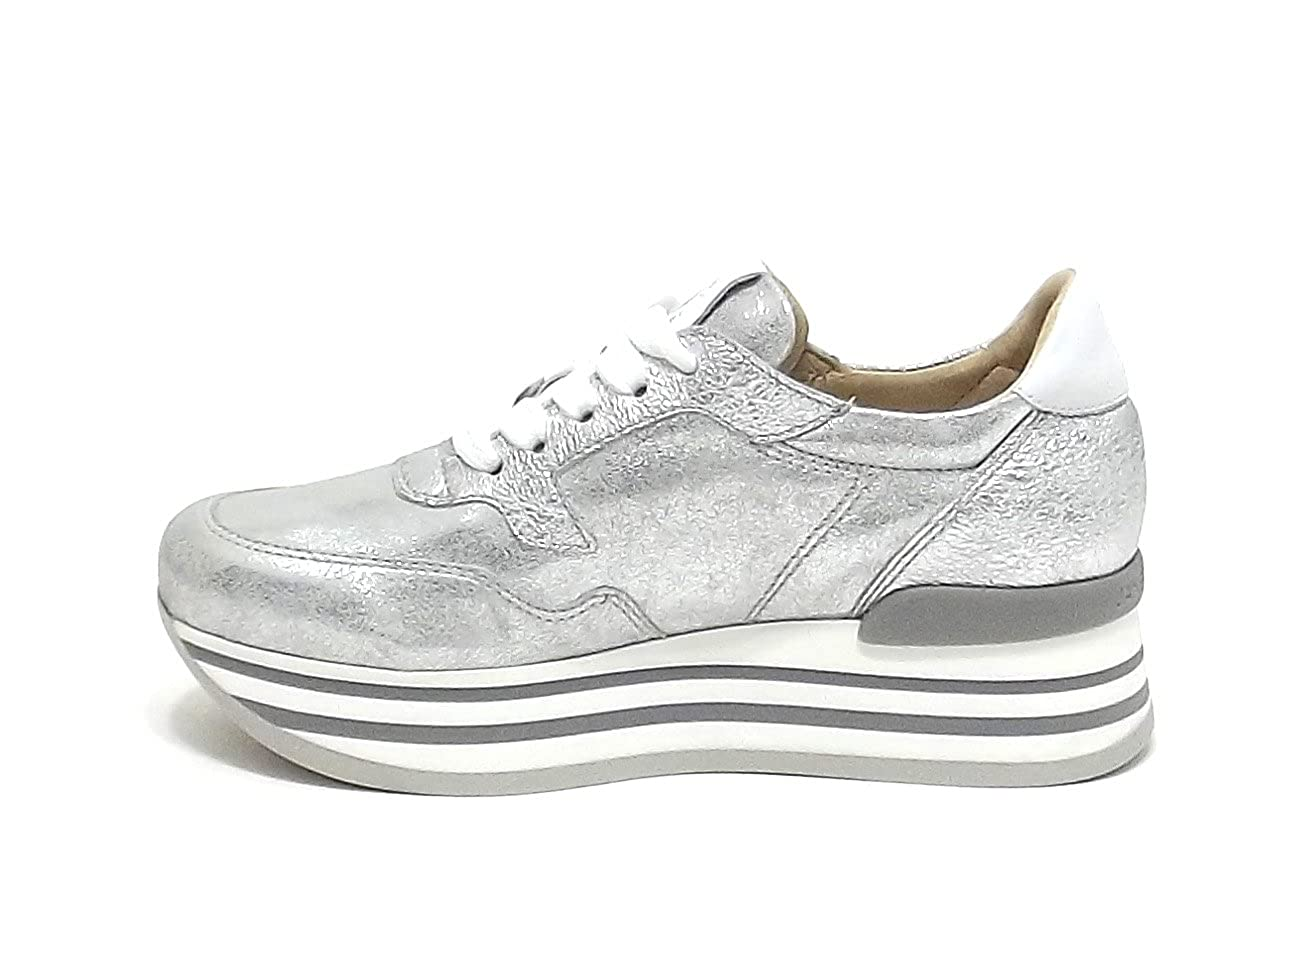 Janet Sport Sport Sport Donna, Articolo 41725, scarpe da ginnastica Pelle, argentoo E8102 47d9c6